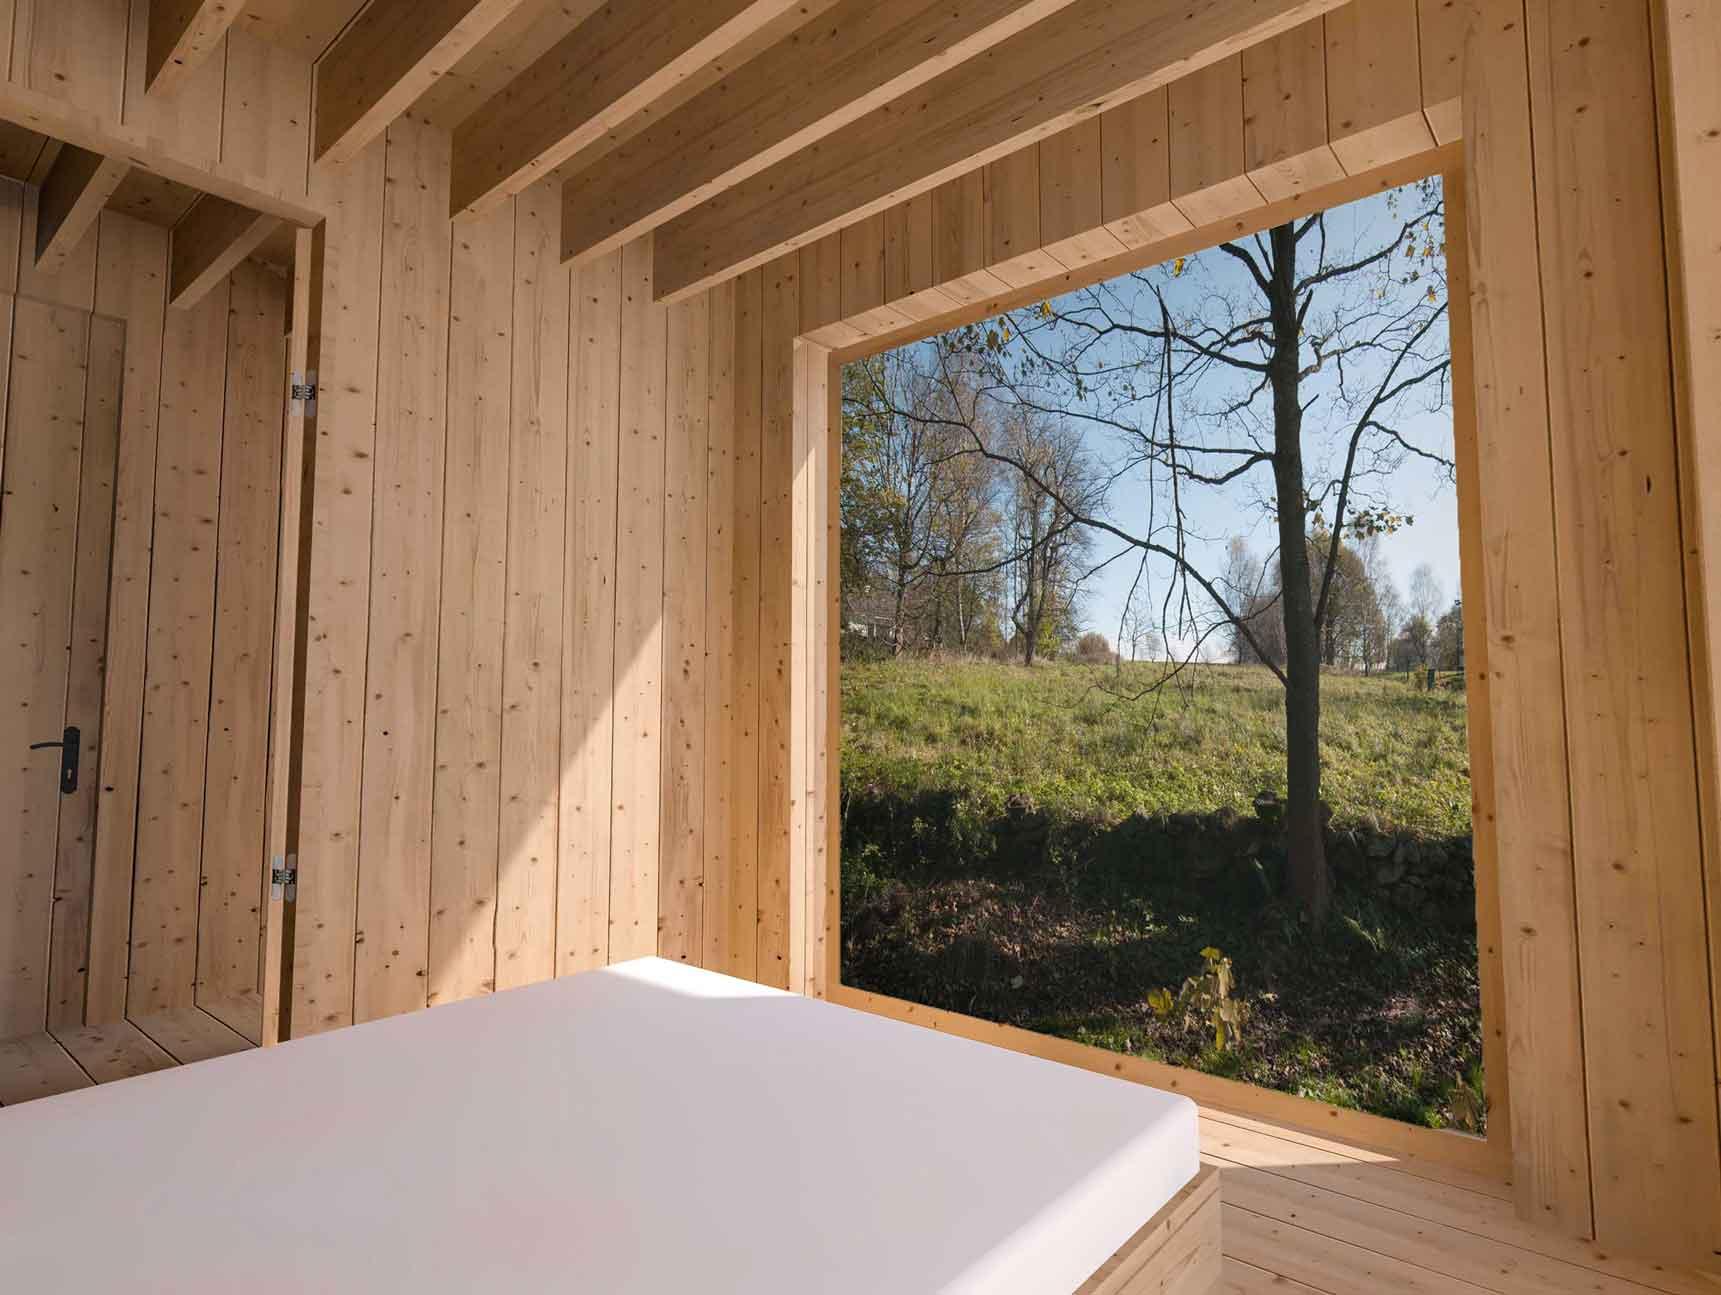 Dům pro jedny architekty - vizualizace interiéru ložnice. Autor: Kurz architekti